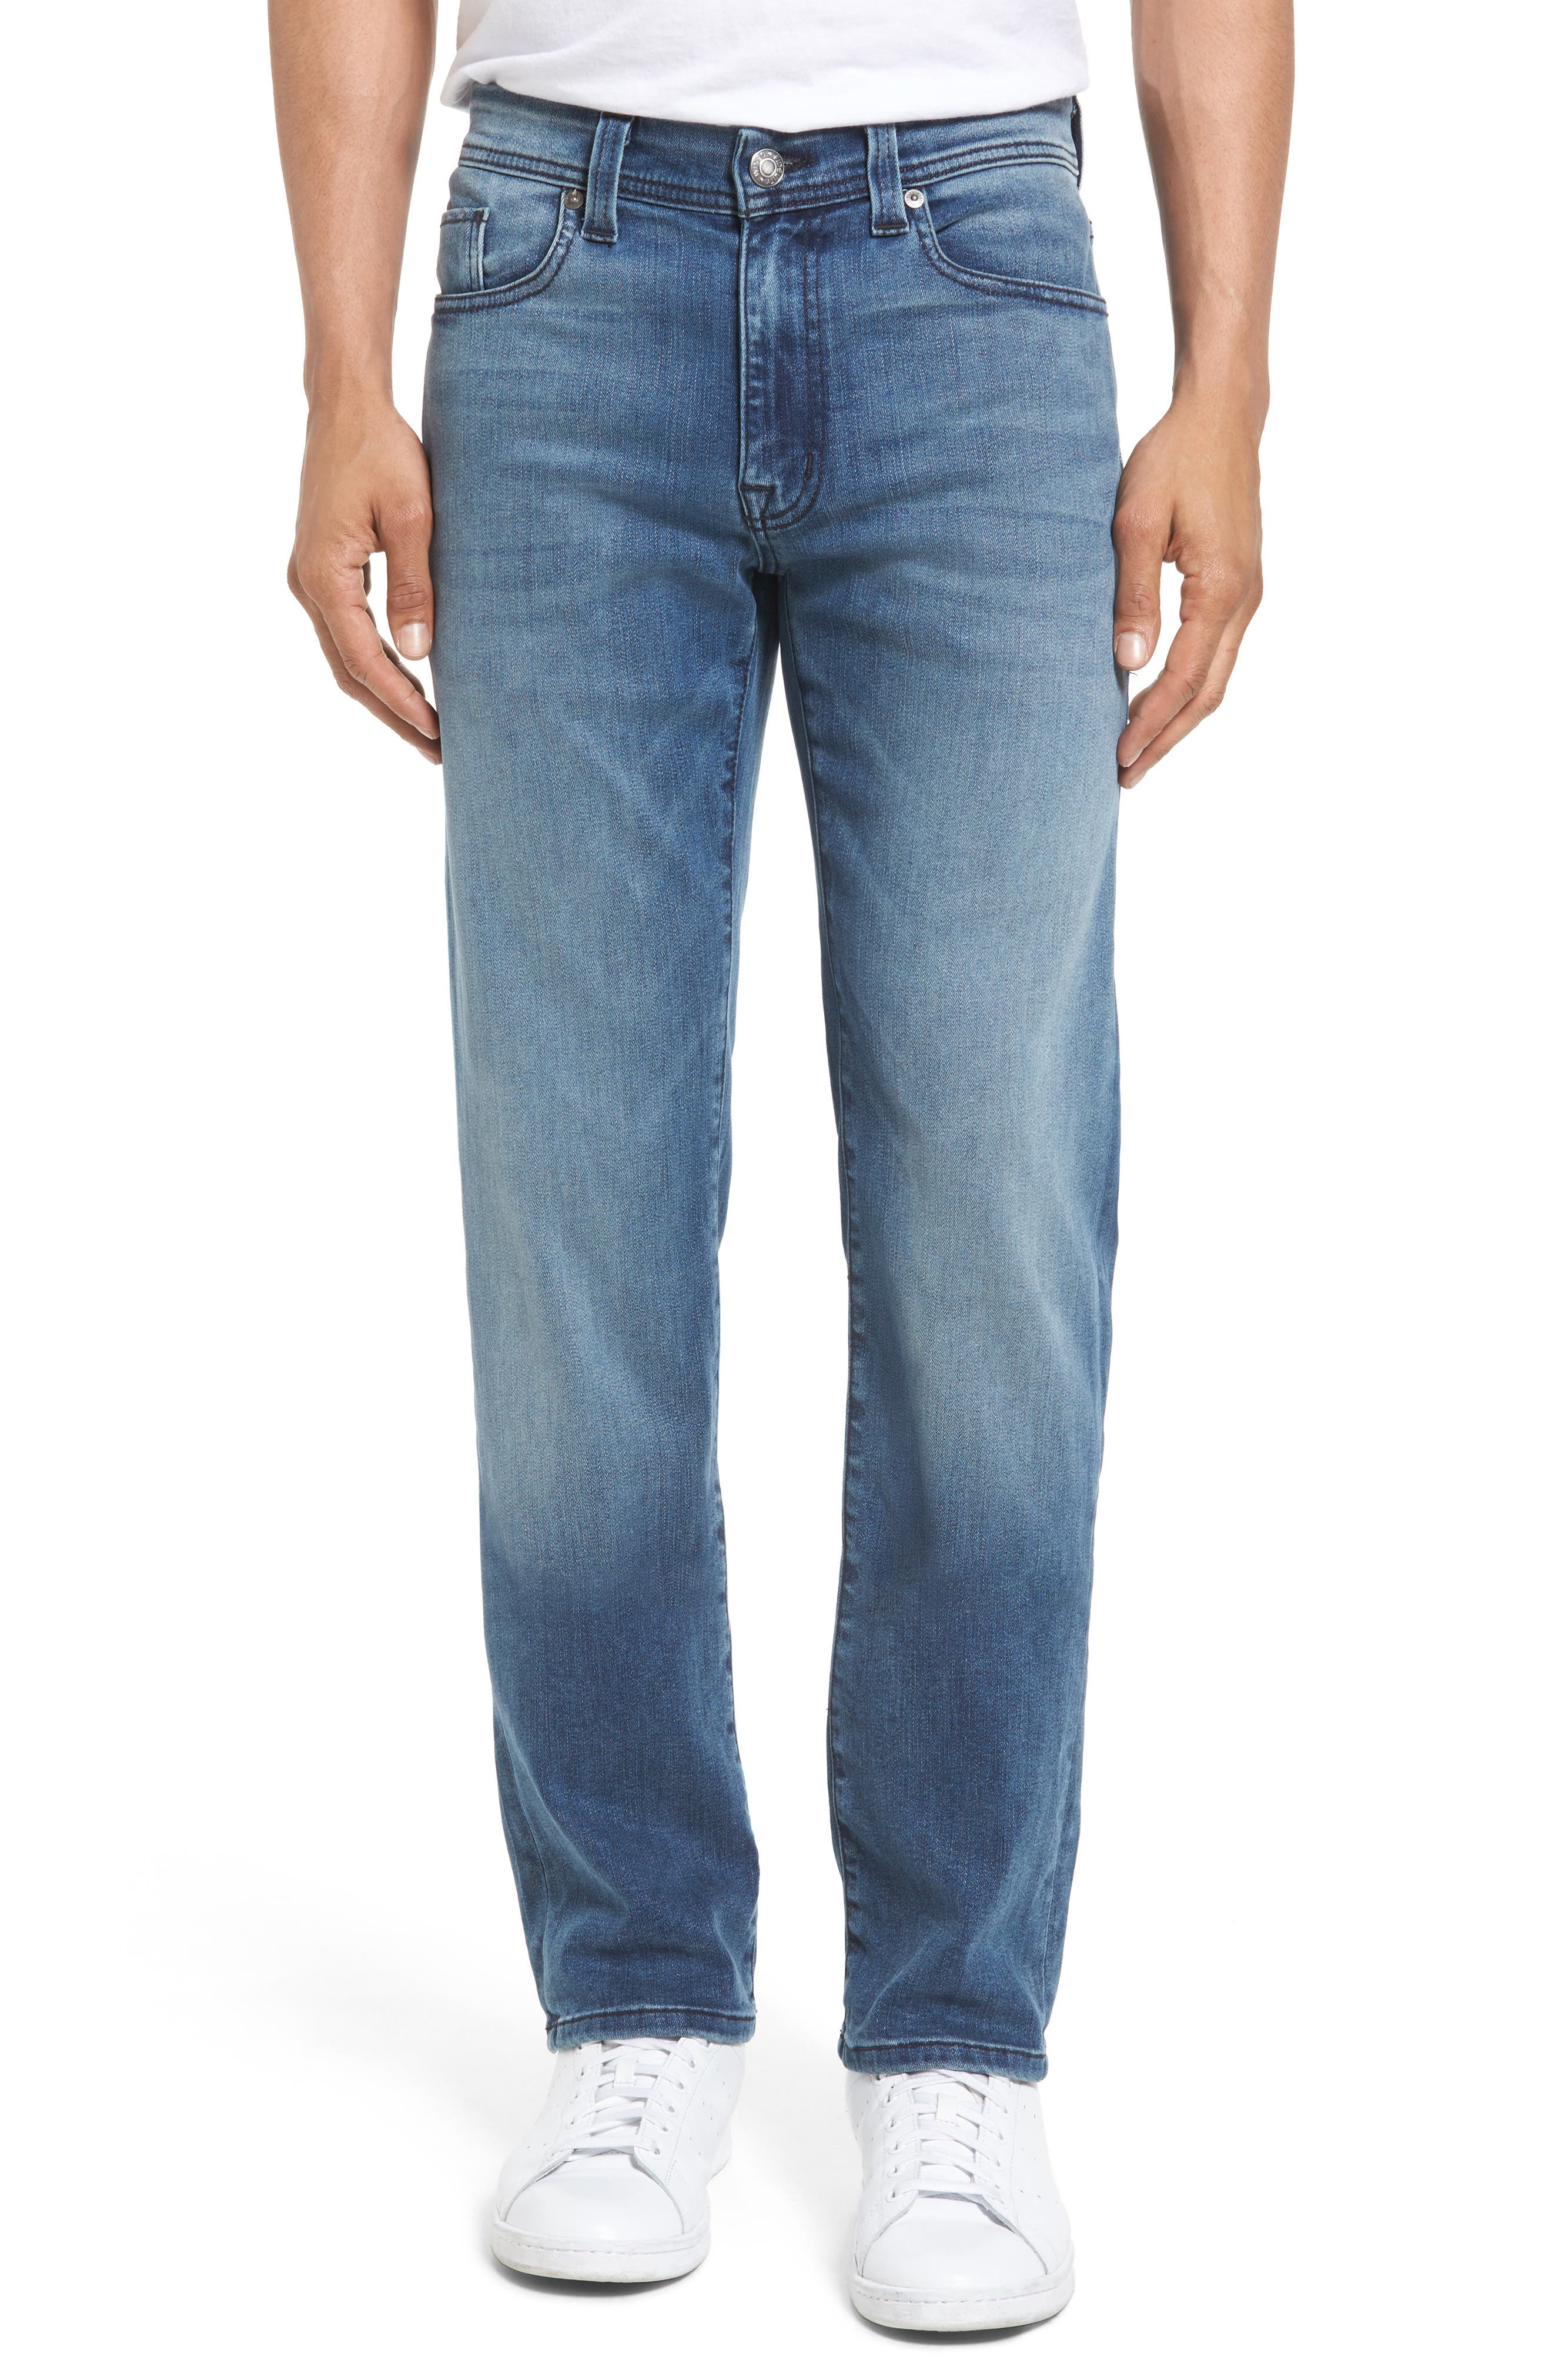 Main Image - Fidelity Denim Jimmy Slim Straight Leg Jeans (Cortana Blue)